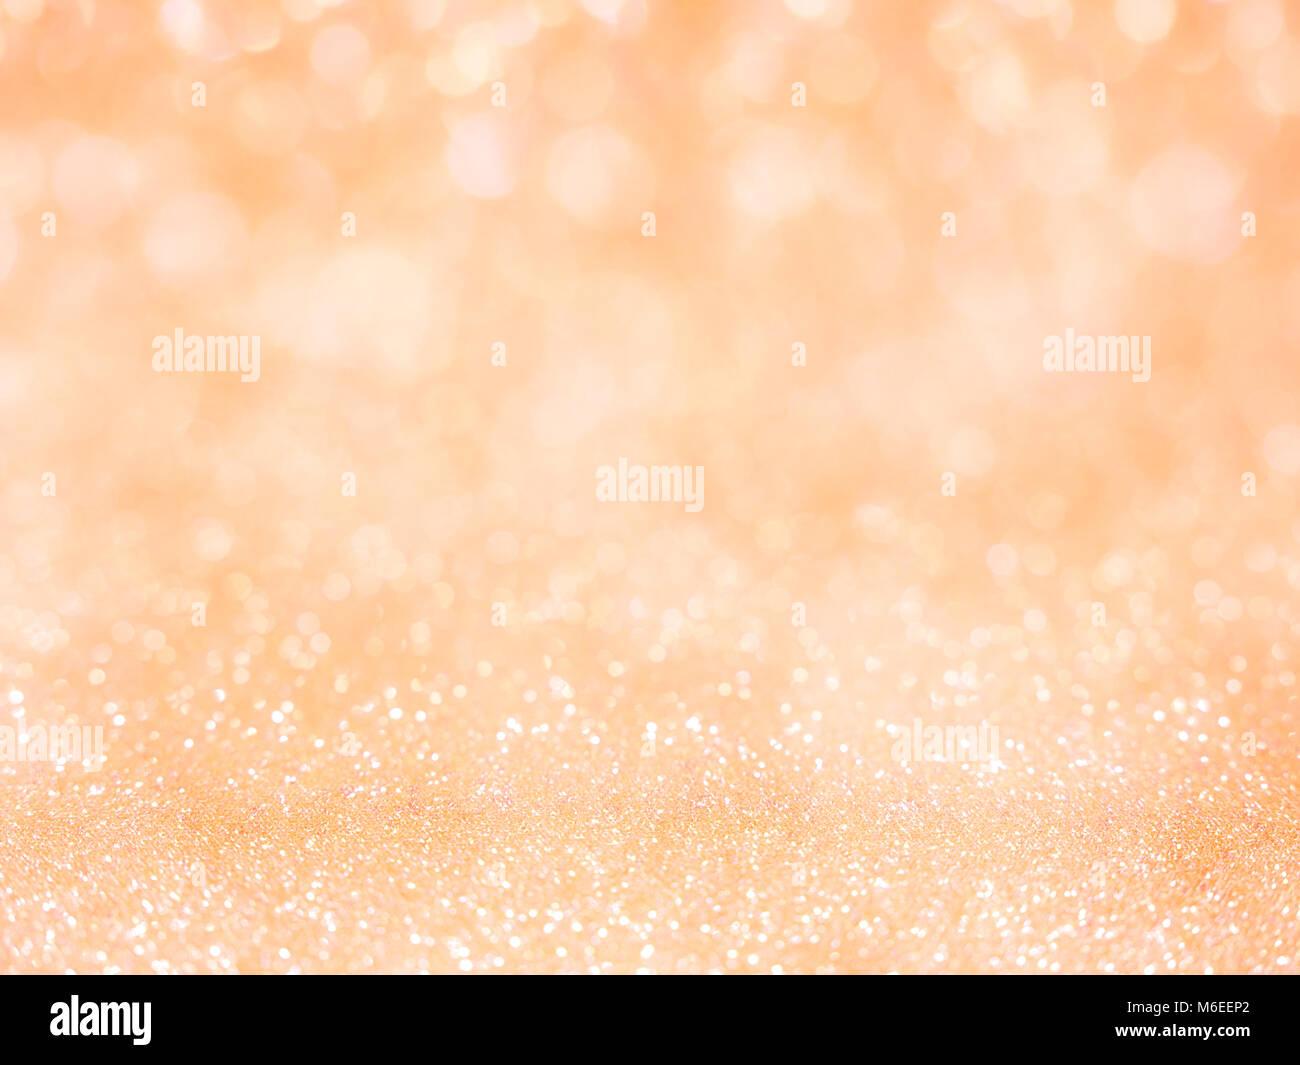 Glitter Wallpaper Stock Photos & Glitter Wallpaper Stock Images - Alamy